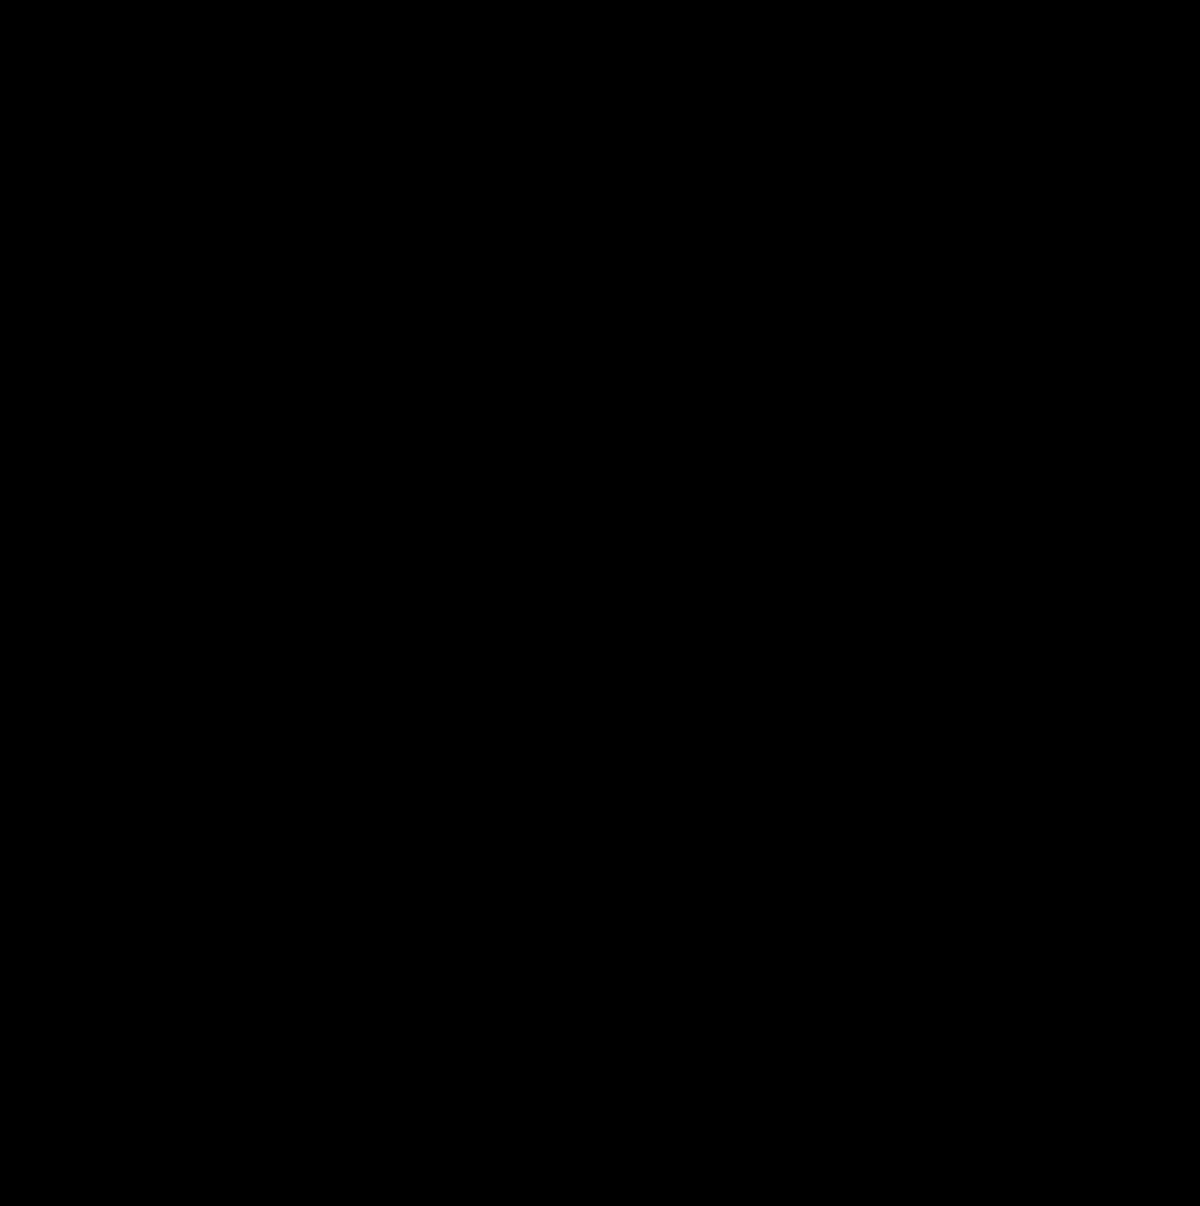 Black rose (symbolism) - Wikipedia - Red Roses Black and White